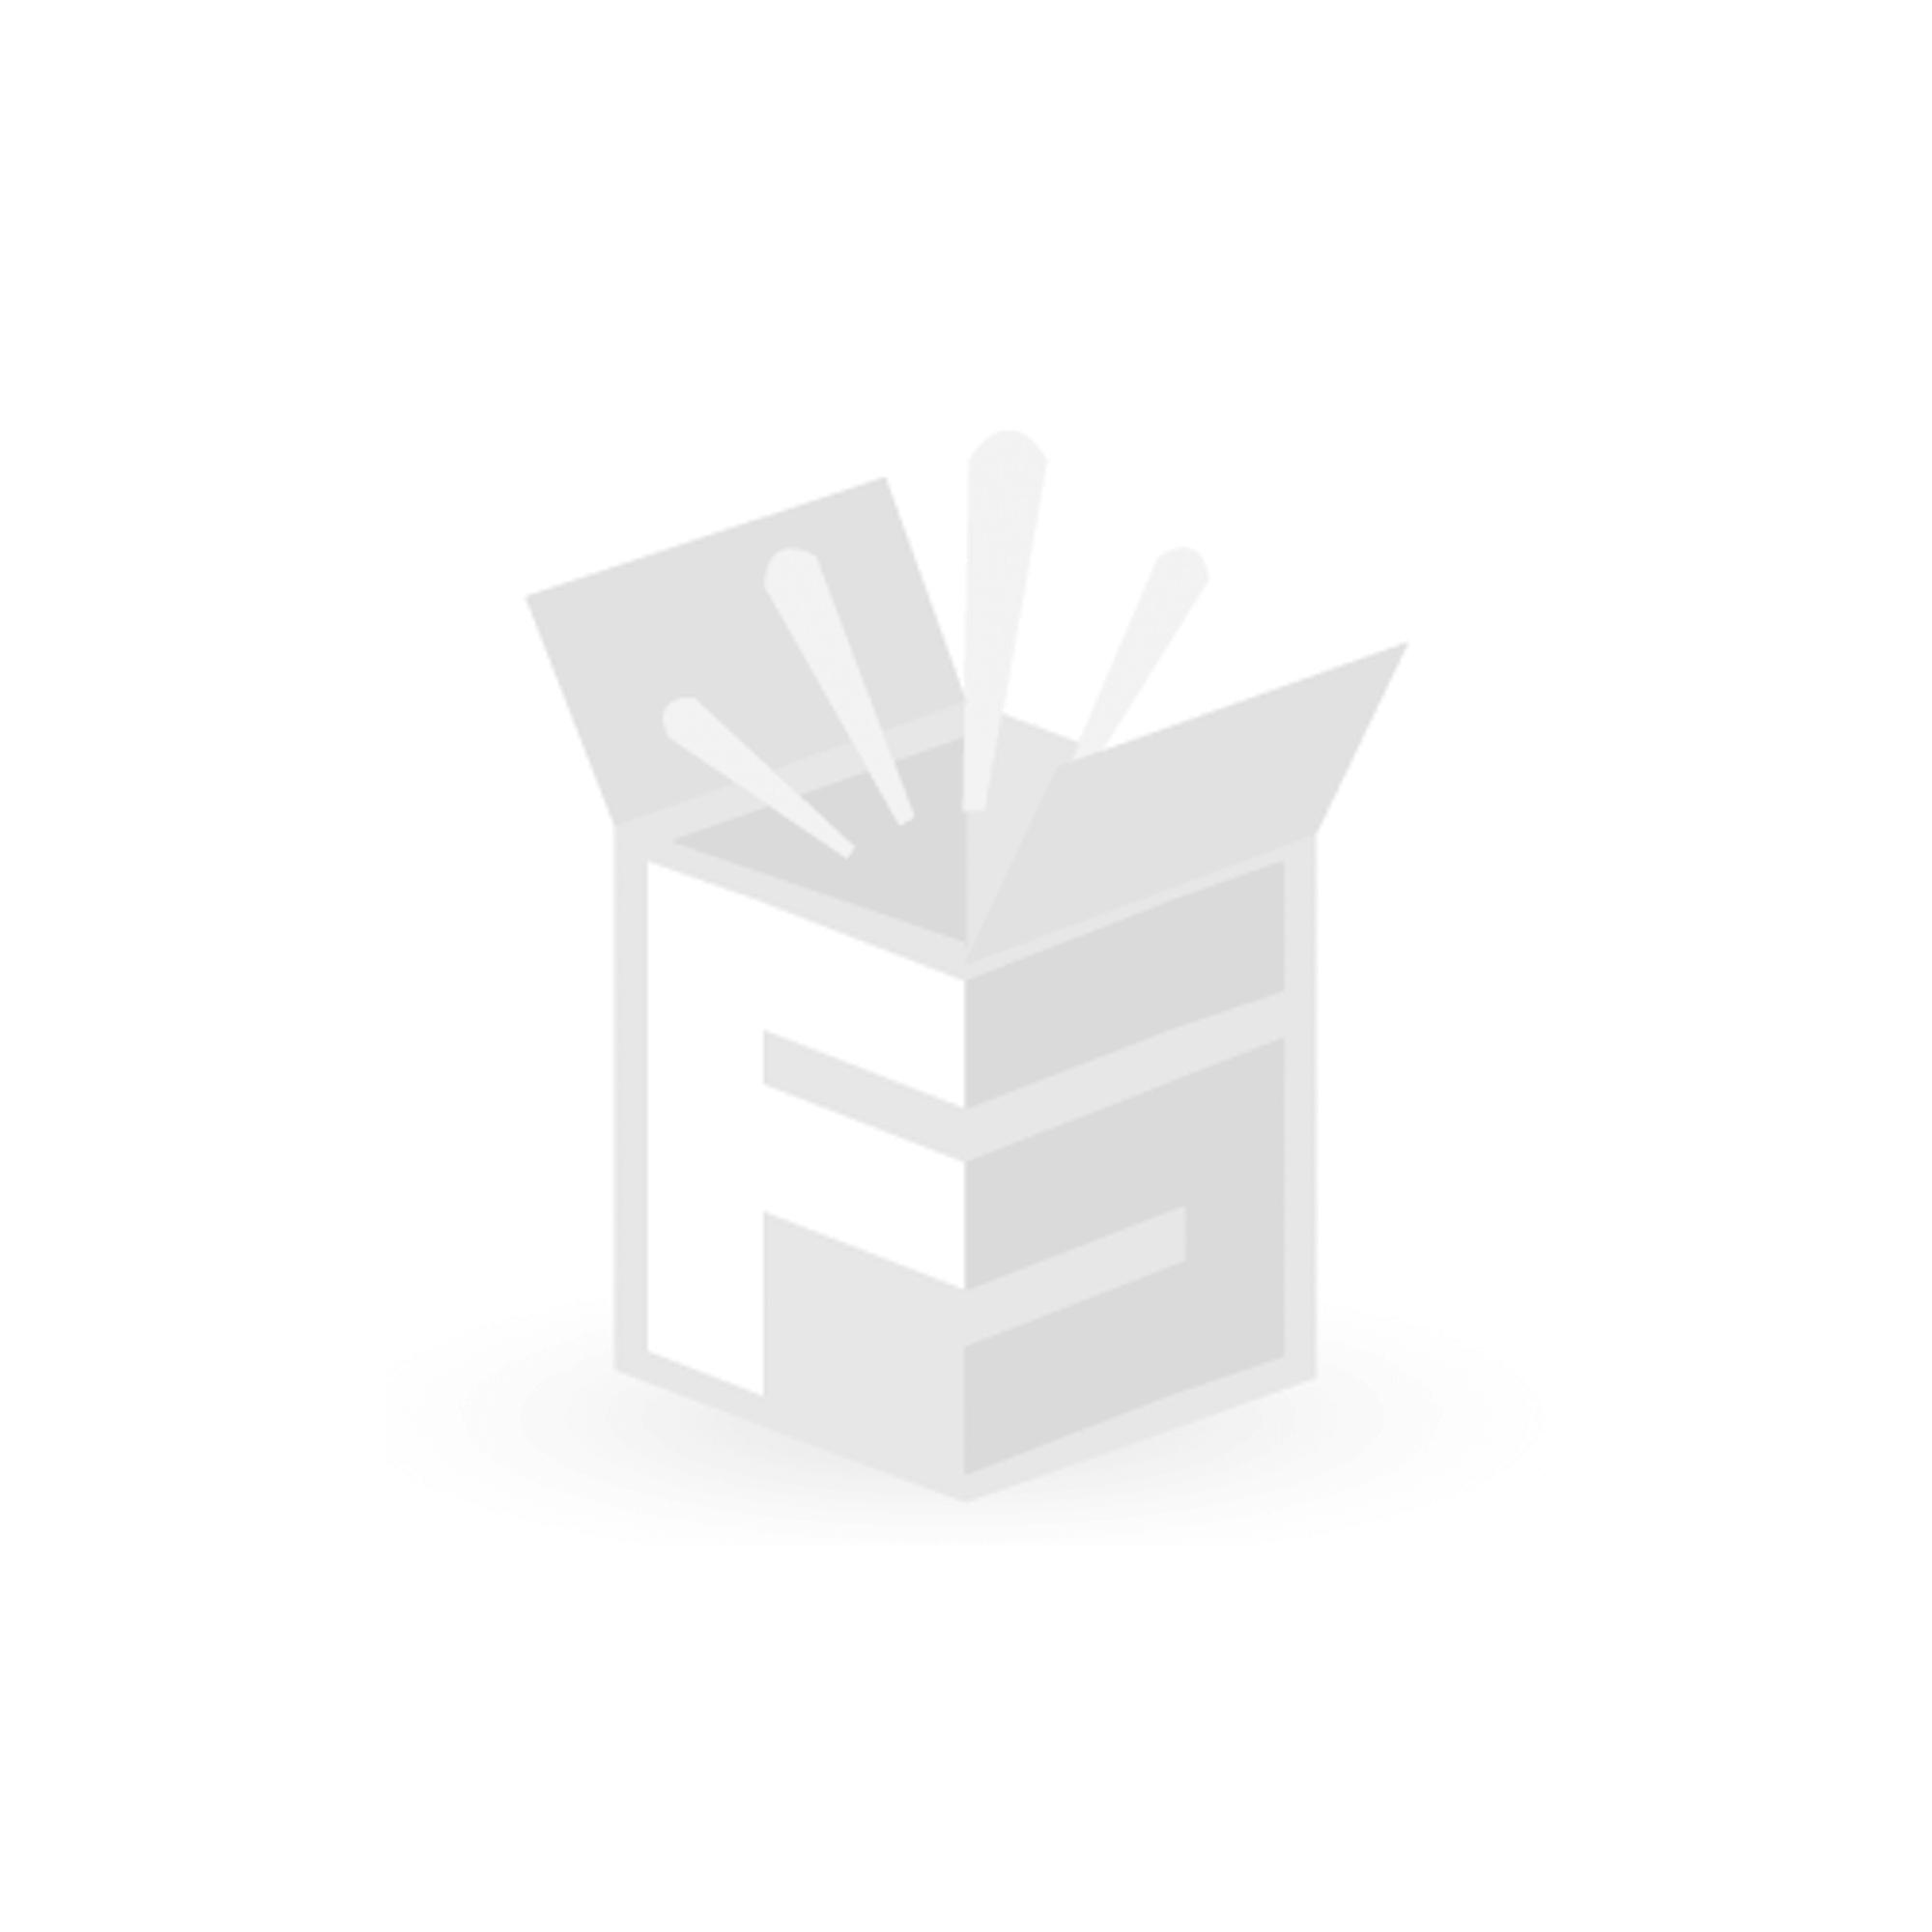 weber tischventilator 30 cm schwarz. Black Bedroom Furniture Sets. Home Design Ideas